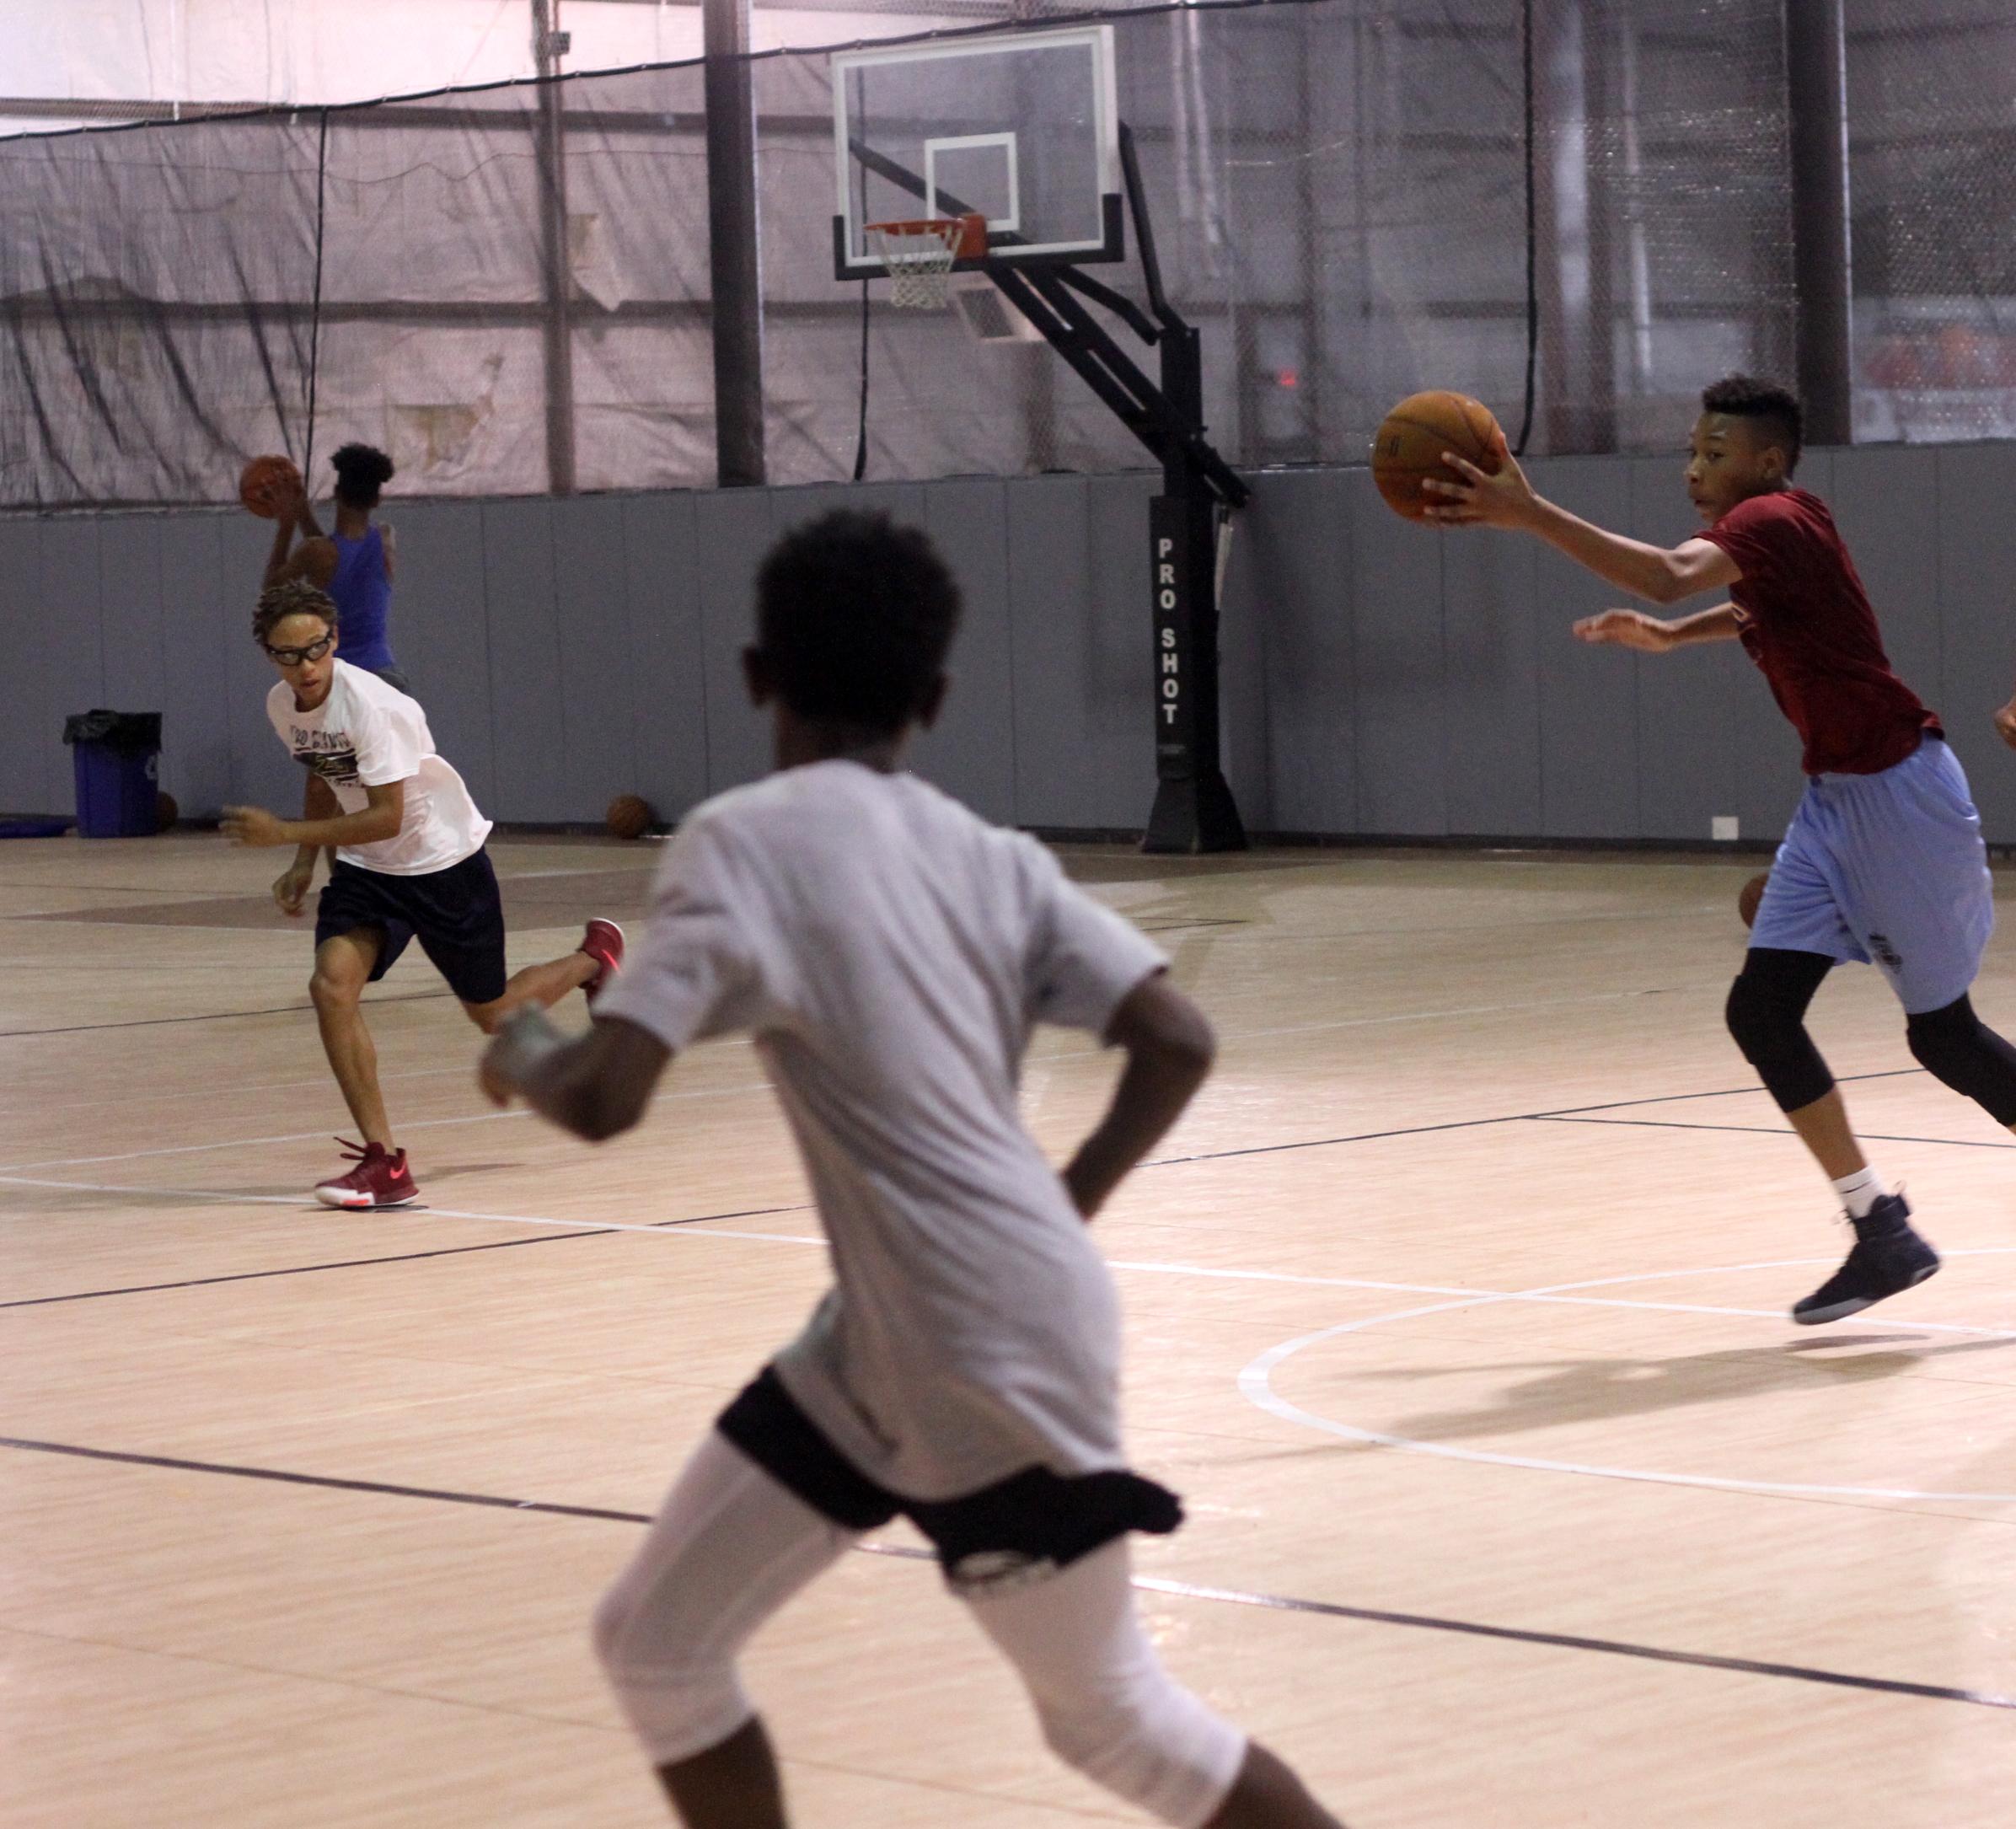 3 boys basketball.jpg